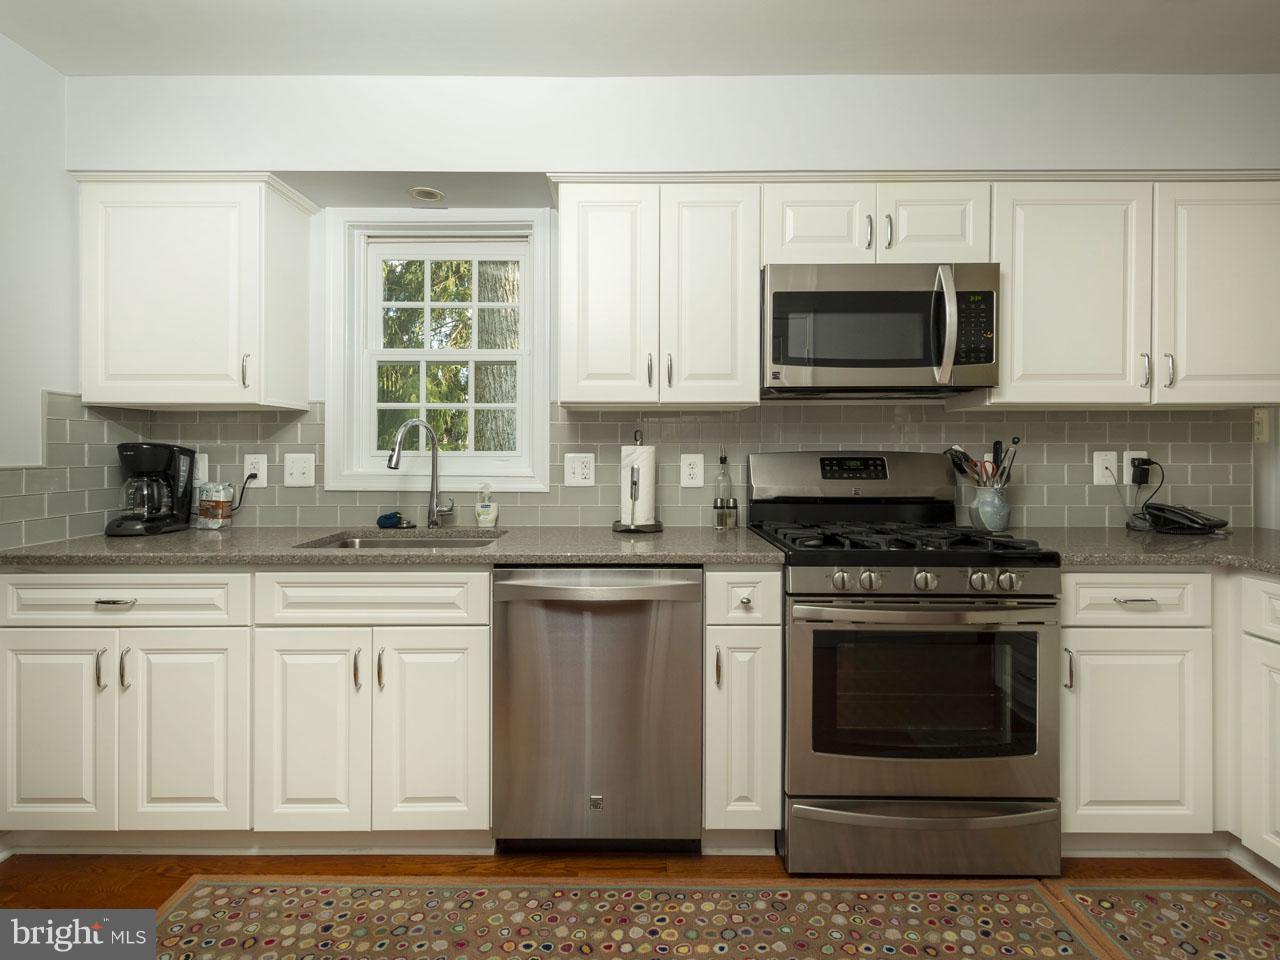 1006211278-300688039058-2021-07-22-07-39-40        Burke Delaware Real Estate For Sale   MLS# 1006211278  - Best of Northern Virginia